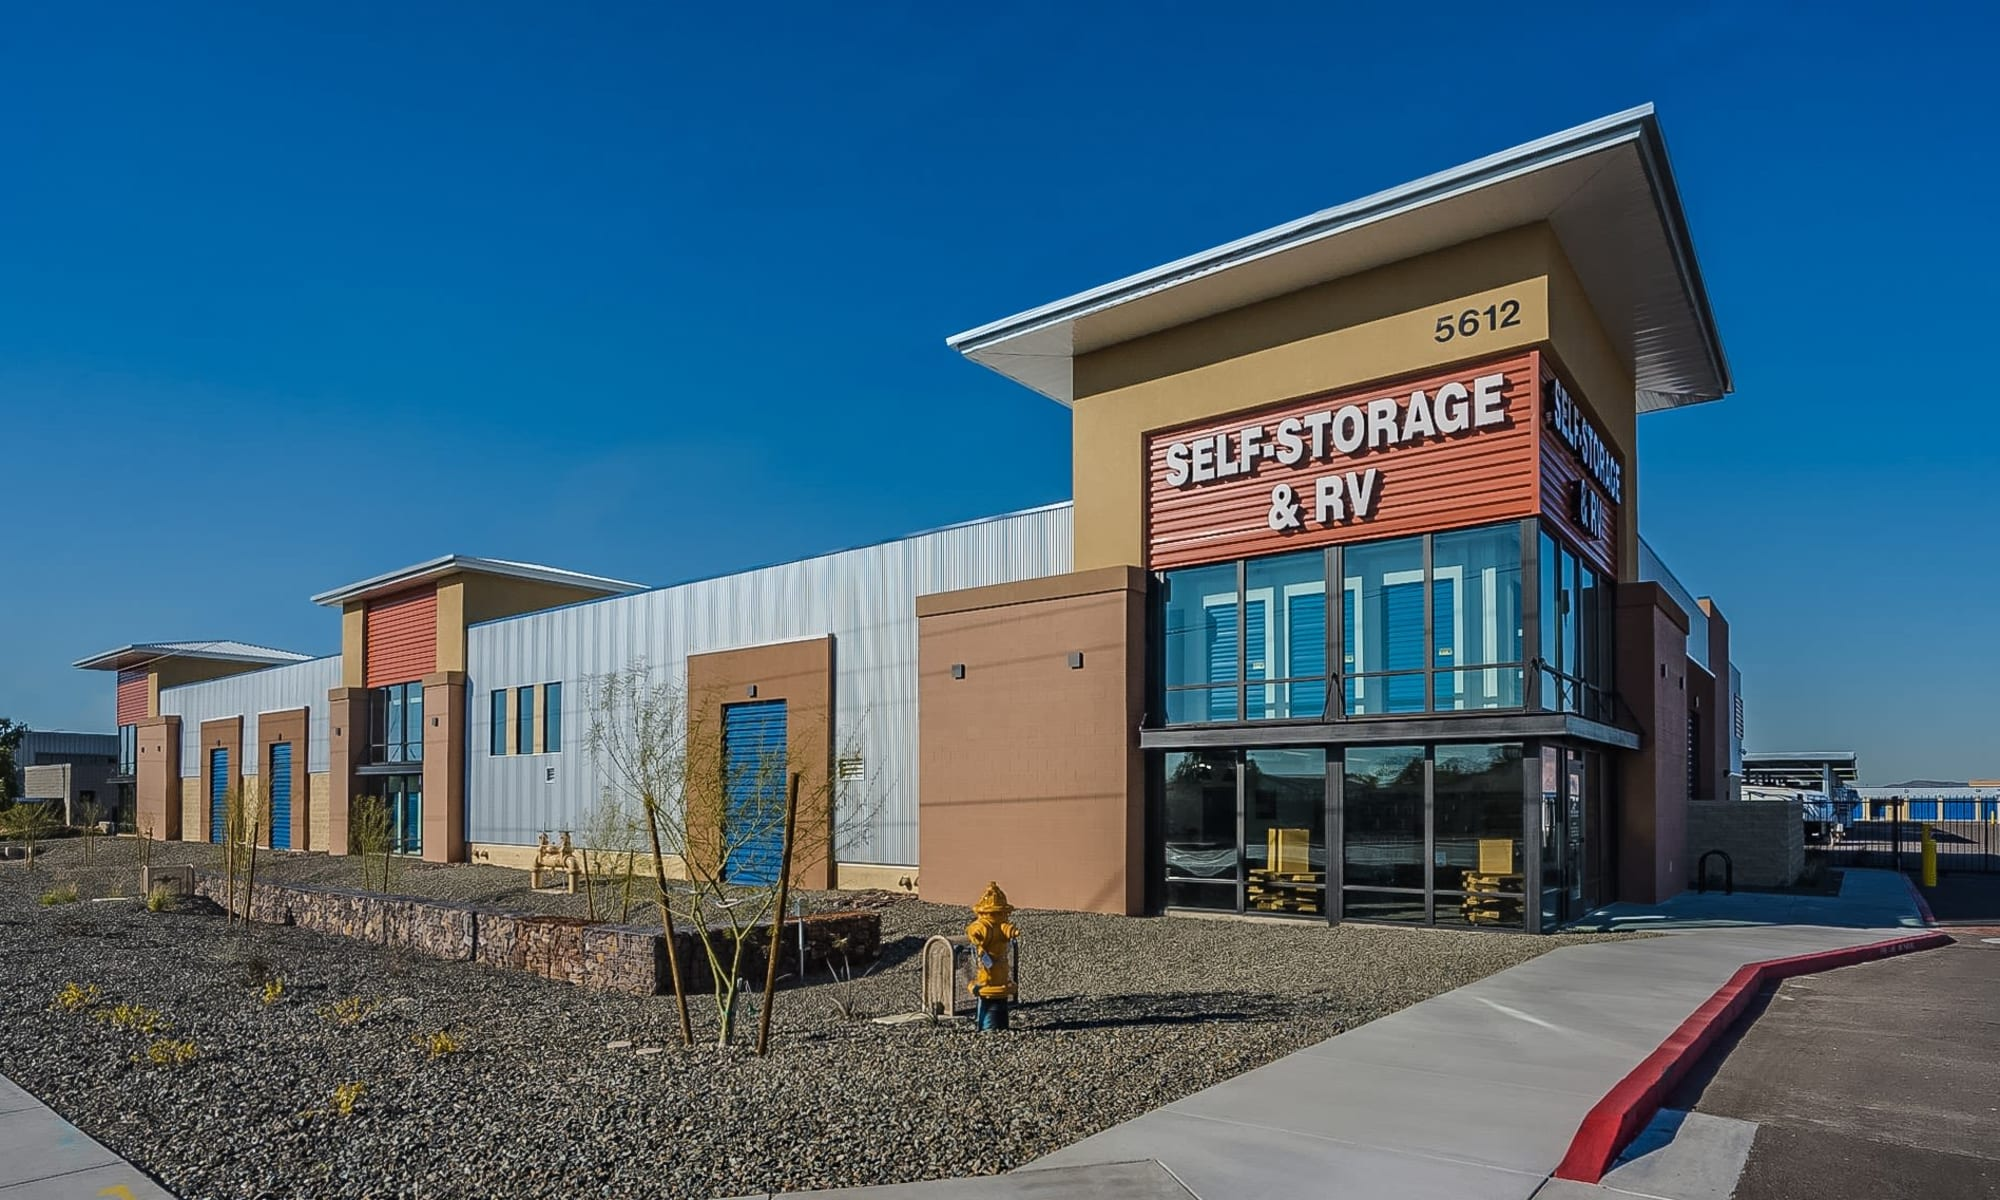 Self storage at Red Mountain Self Storage & RV in Mesa, Arizona